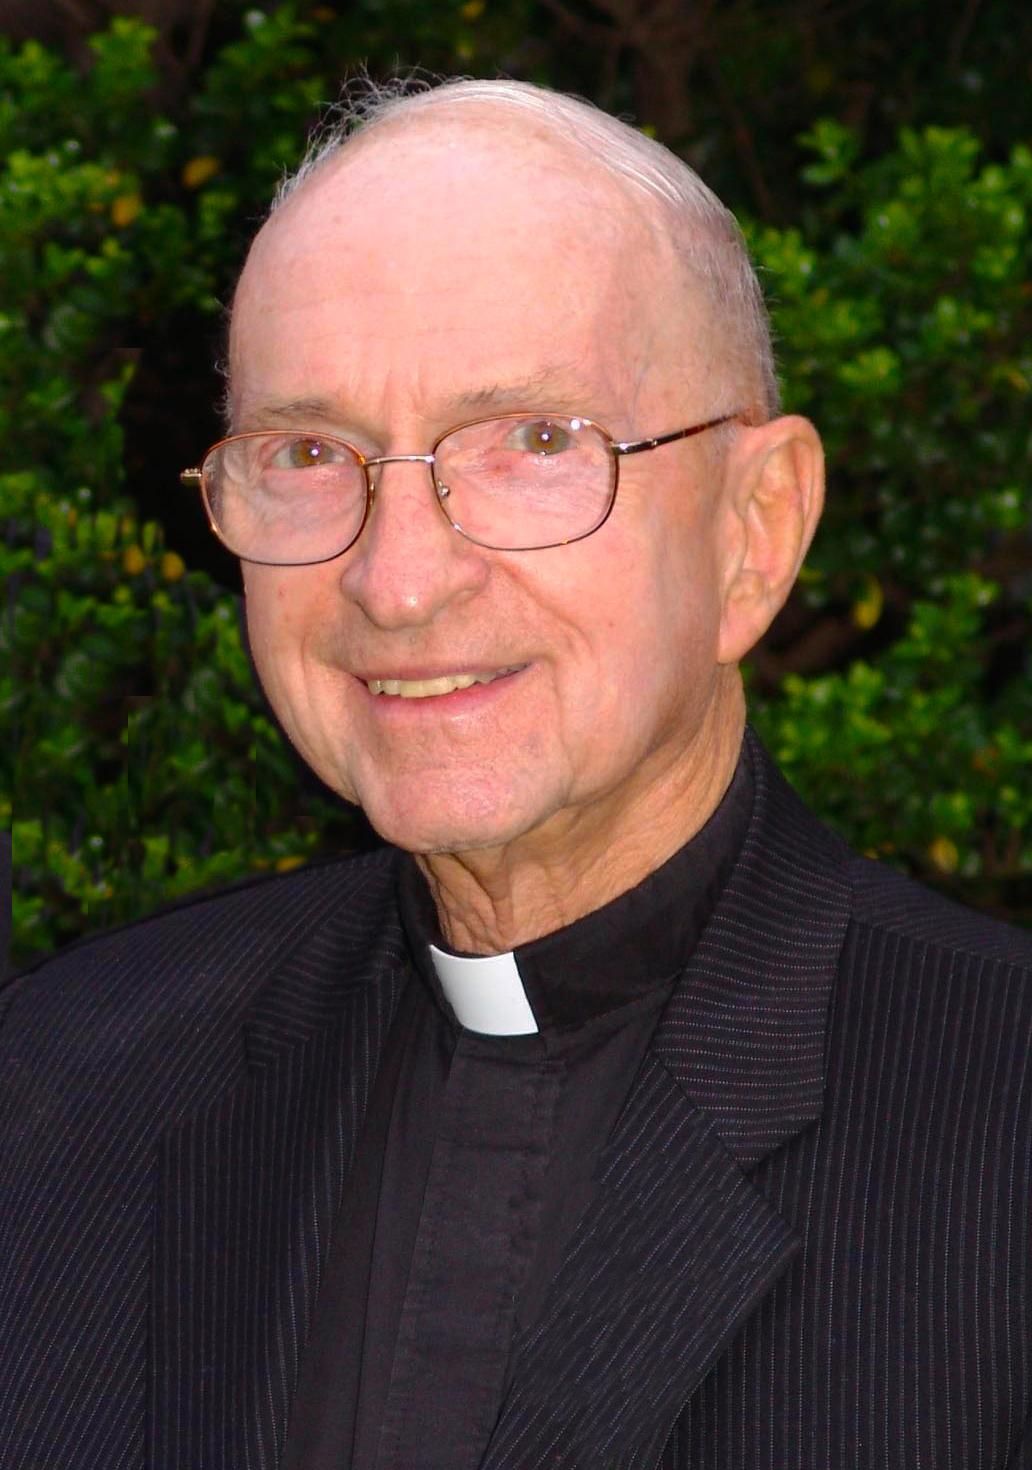 Monsignor Kleissler